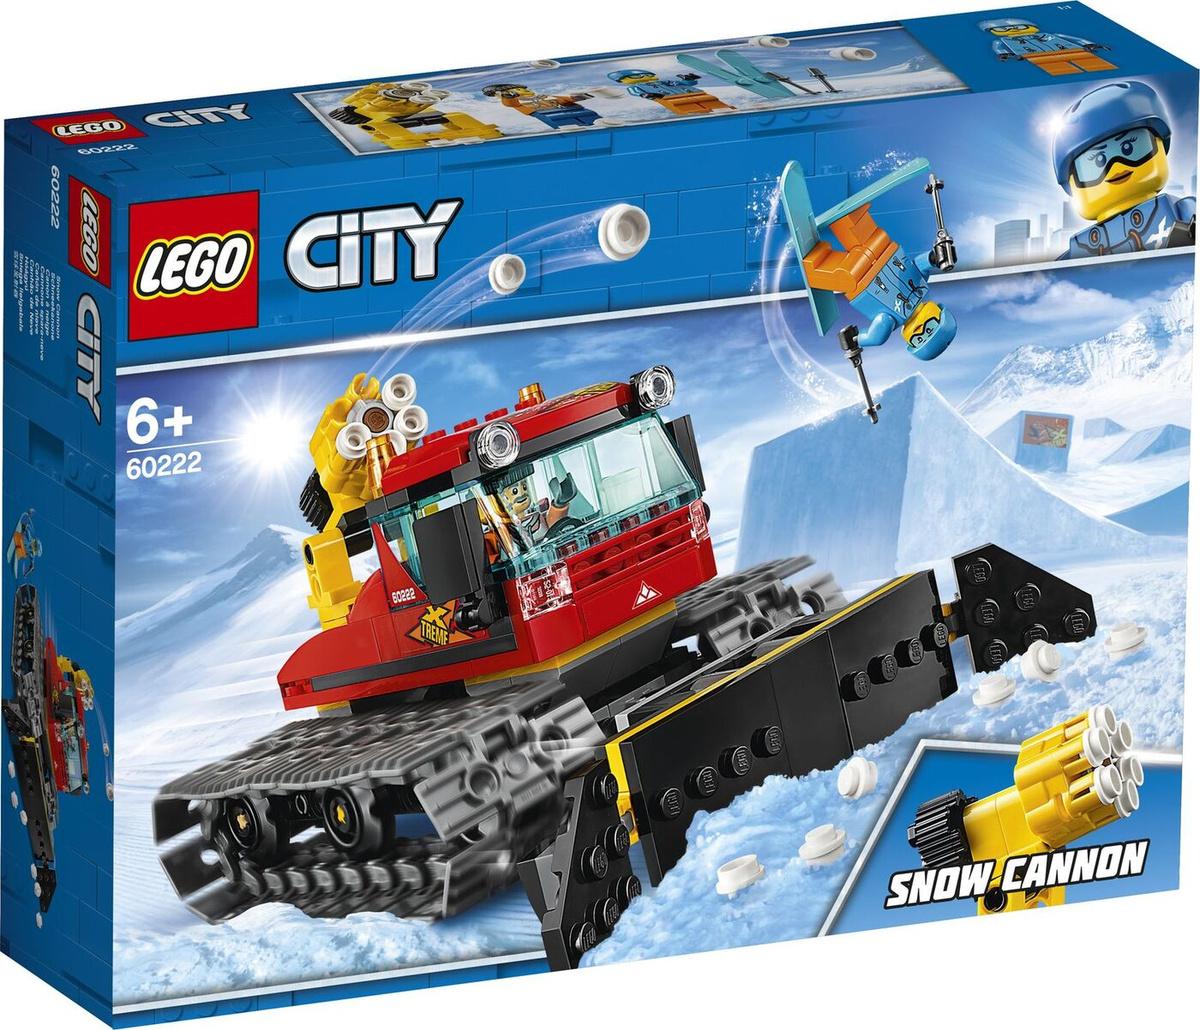 Конструктор LEGO City Great Vehicles 60222 Снегоуборочная машина #1